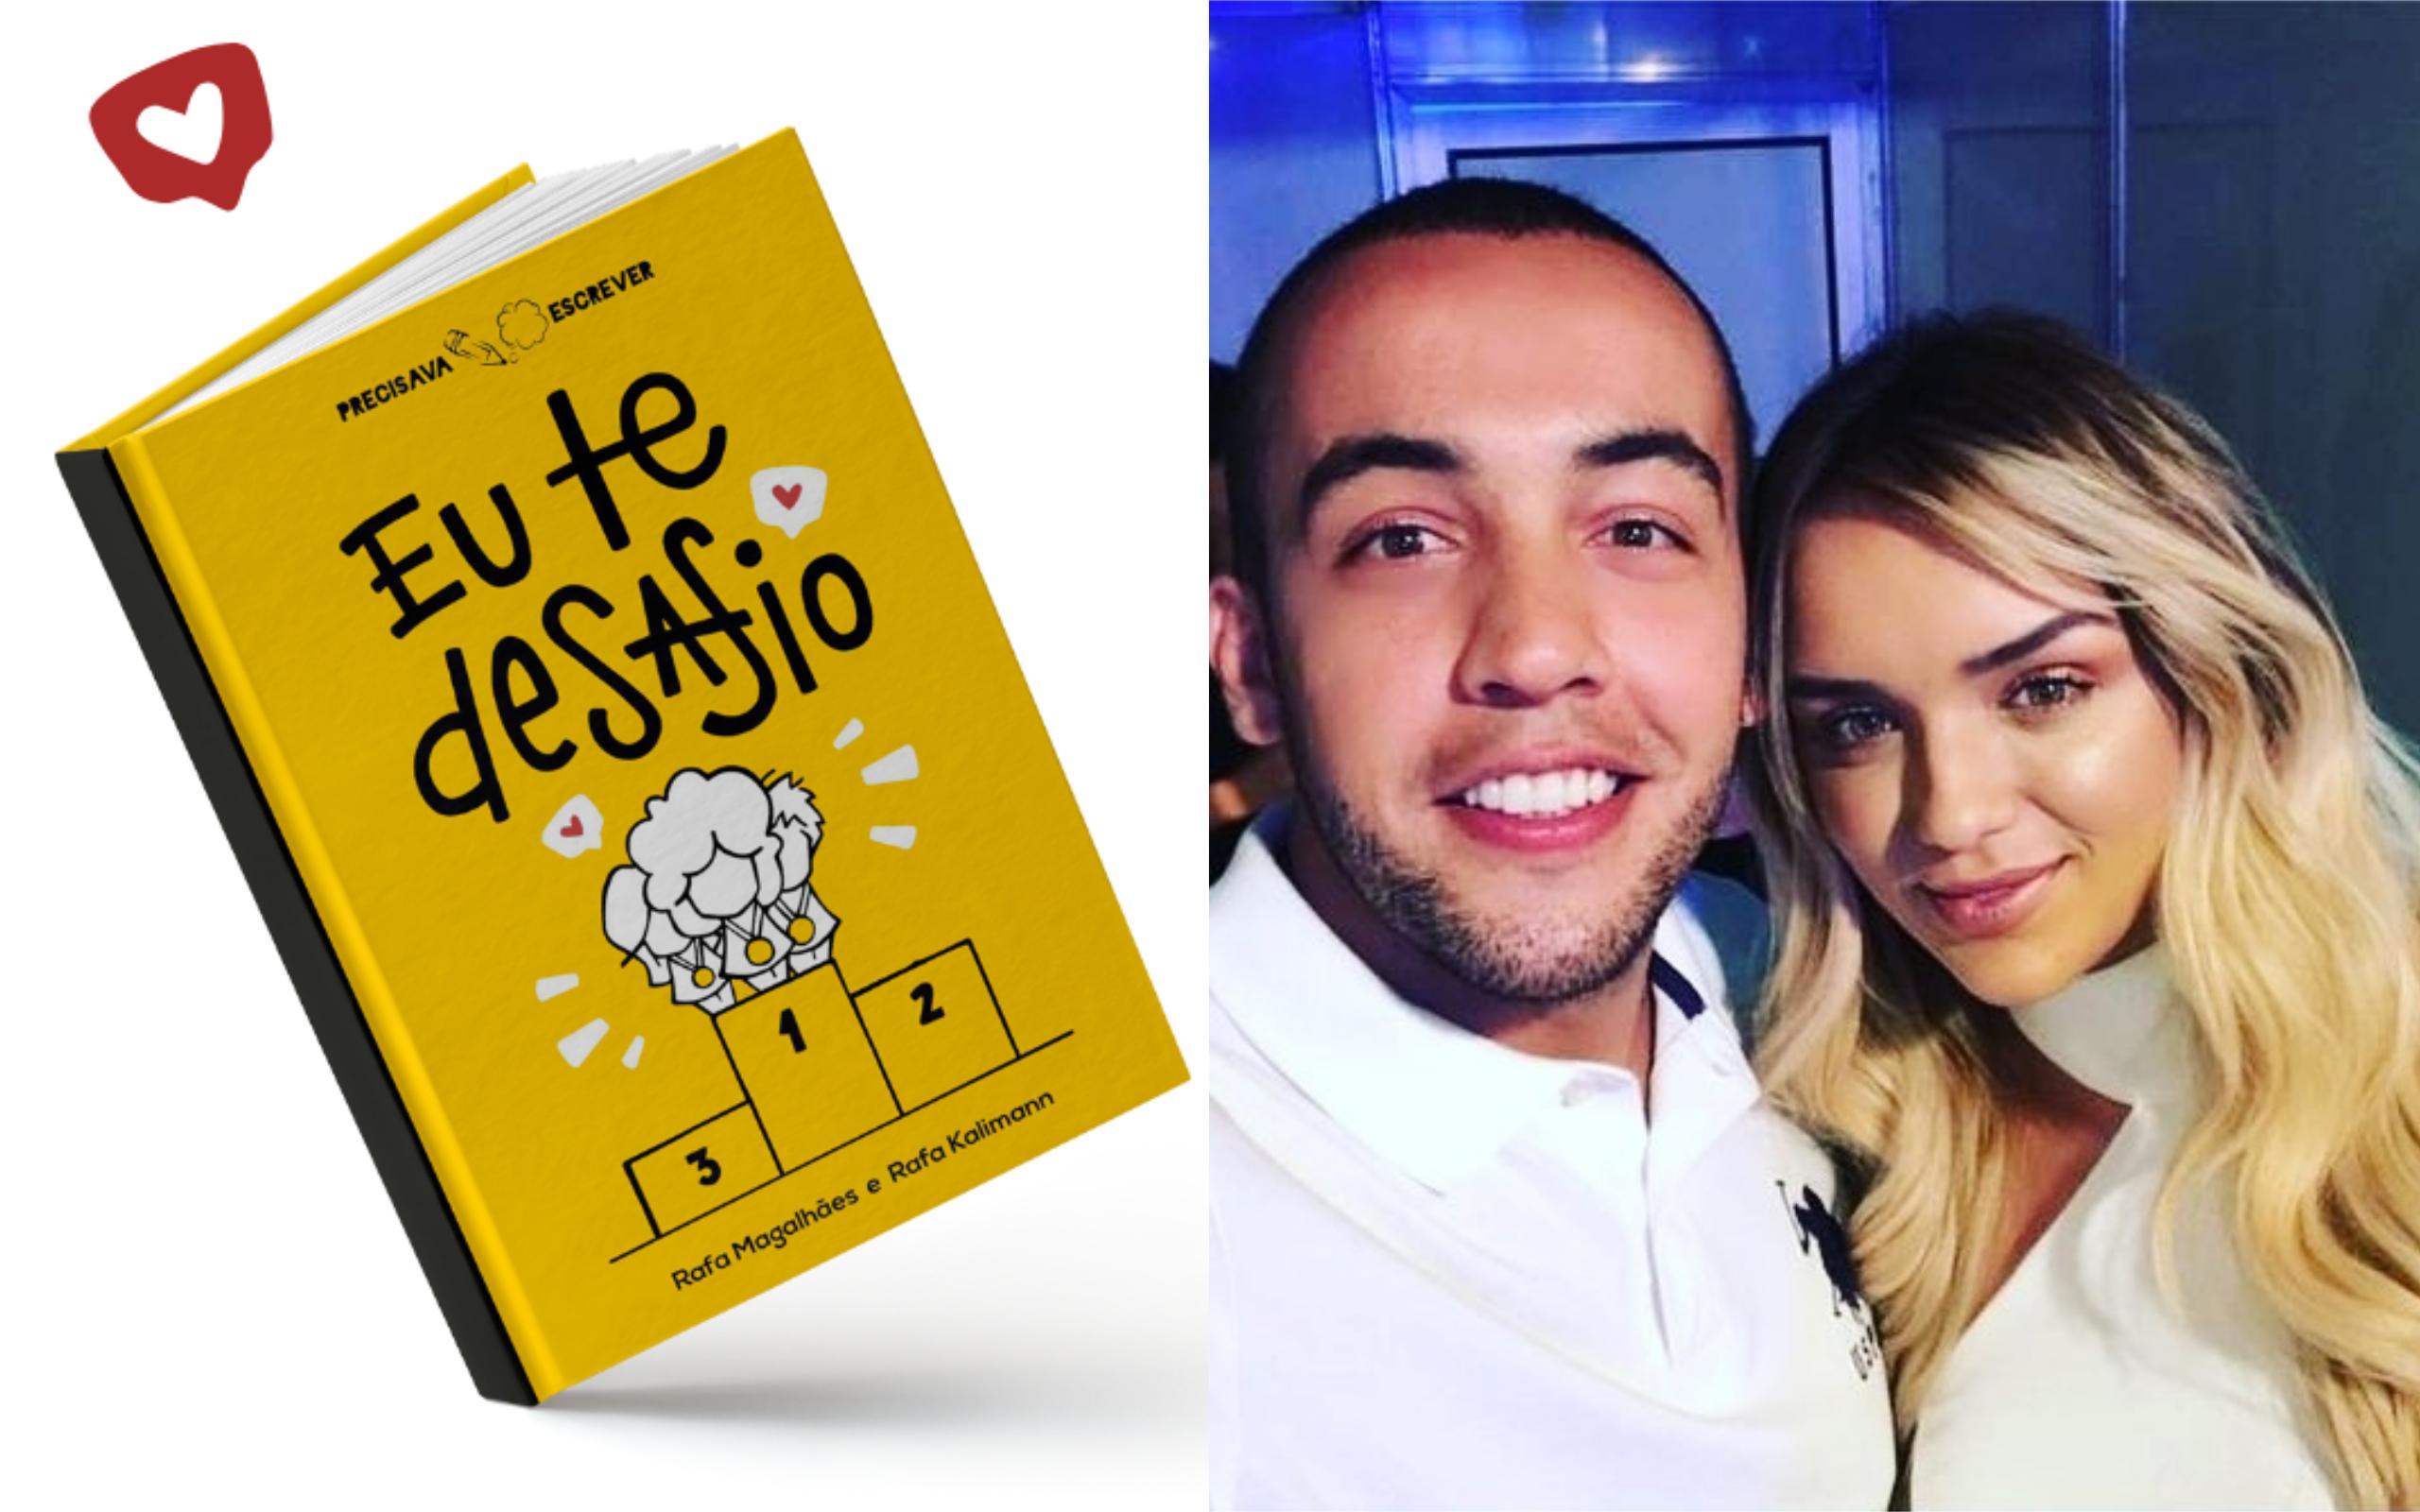 Rafa Kalimann e Rafael Magalhães lançam livro em Goiânia